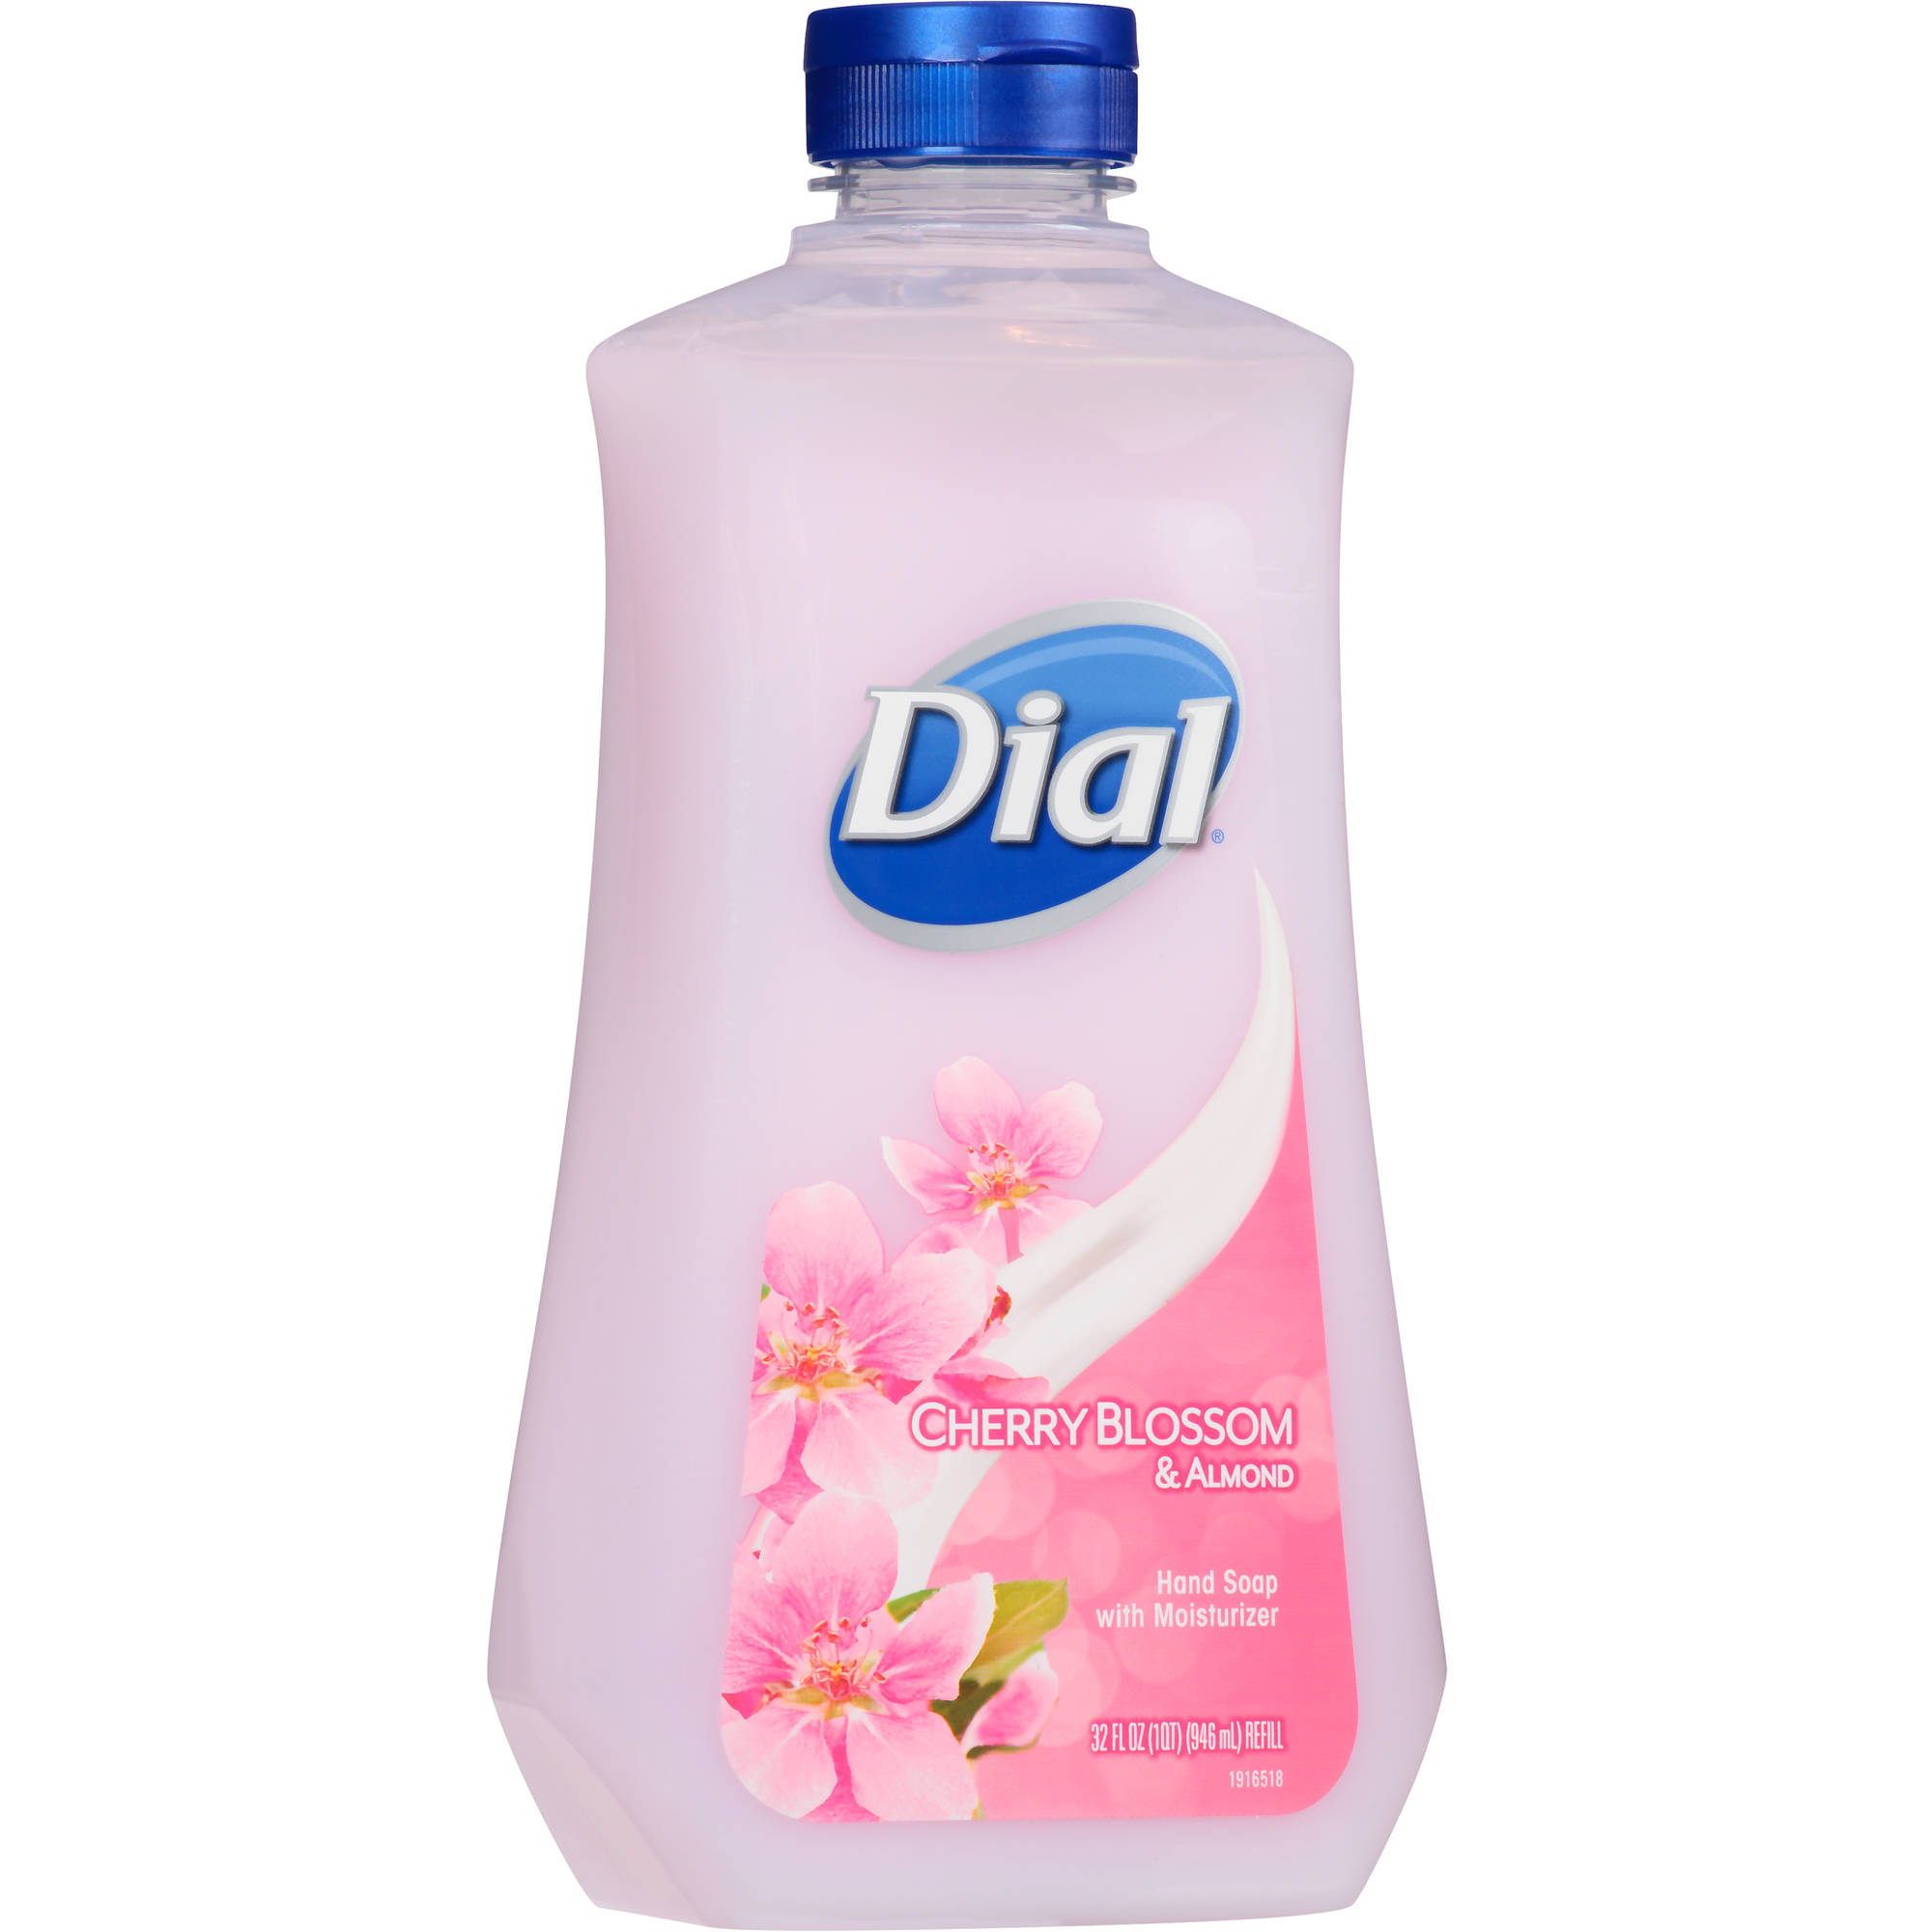 Dial Lhs Refill 6/32oz Cherry Blossom &